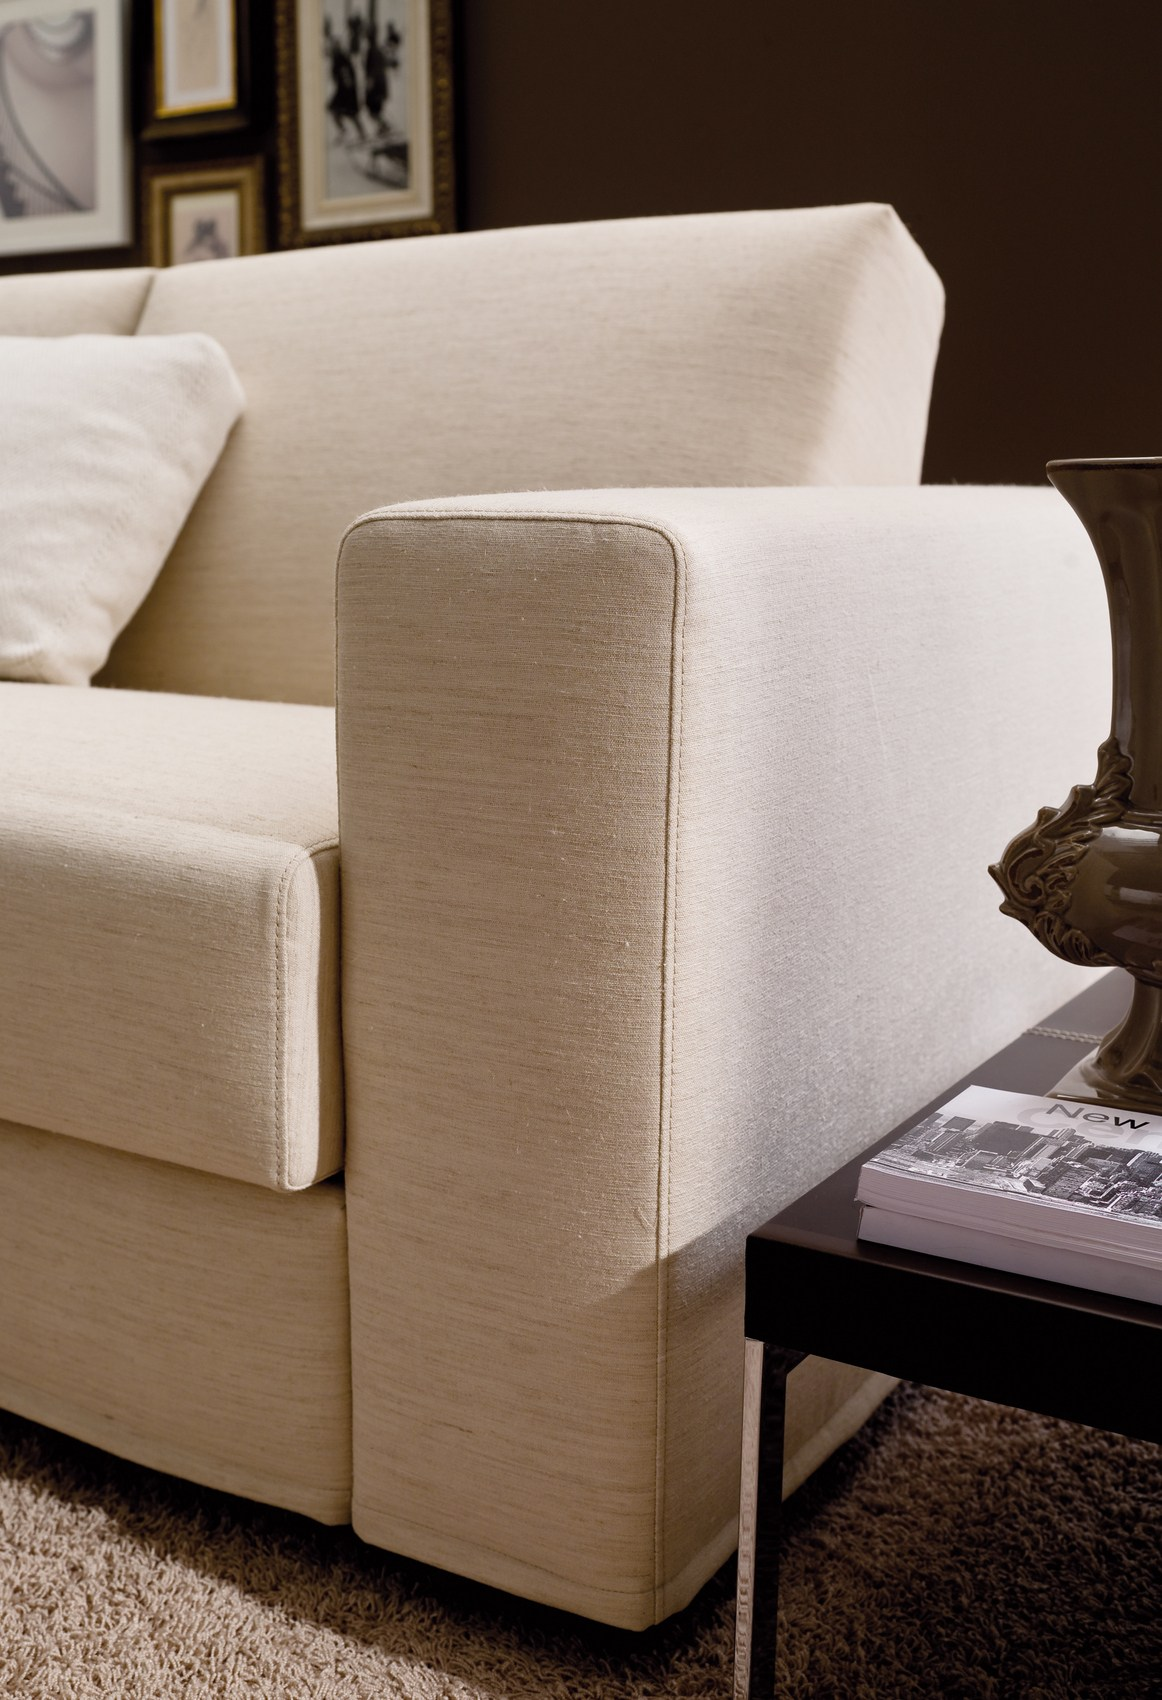 casa italy sofa bed cottage chic slipcovers corner elko by bontempi design erresse studio